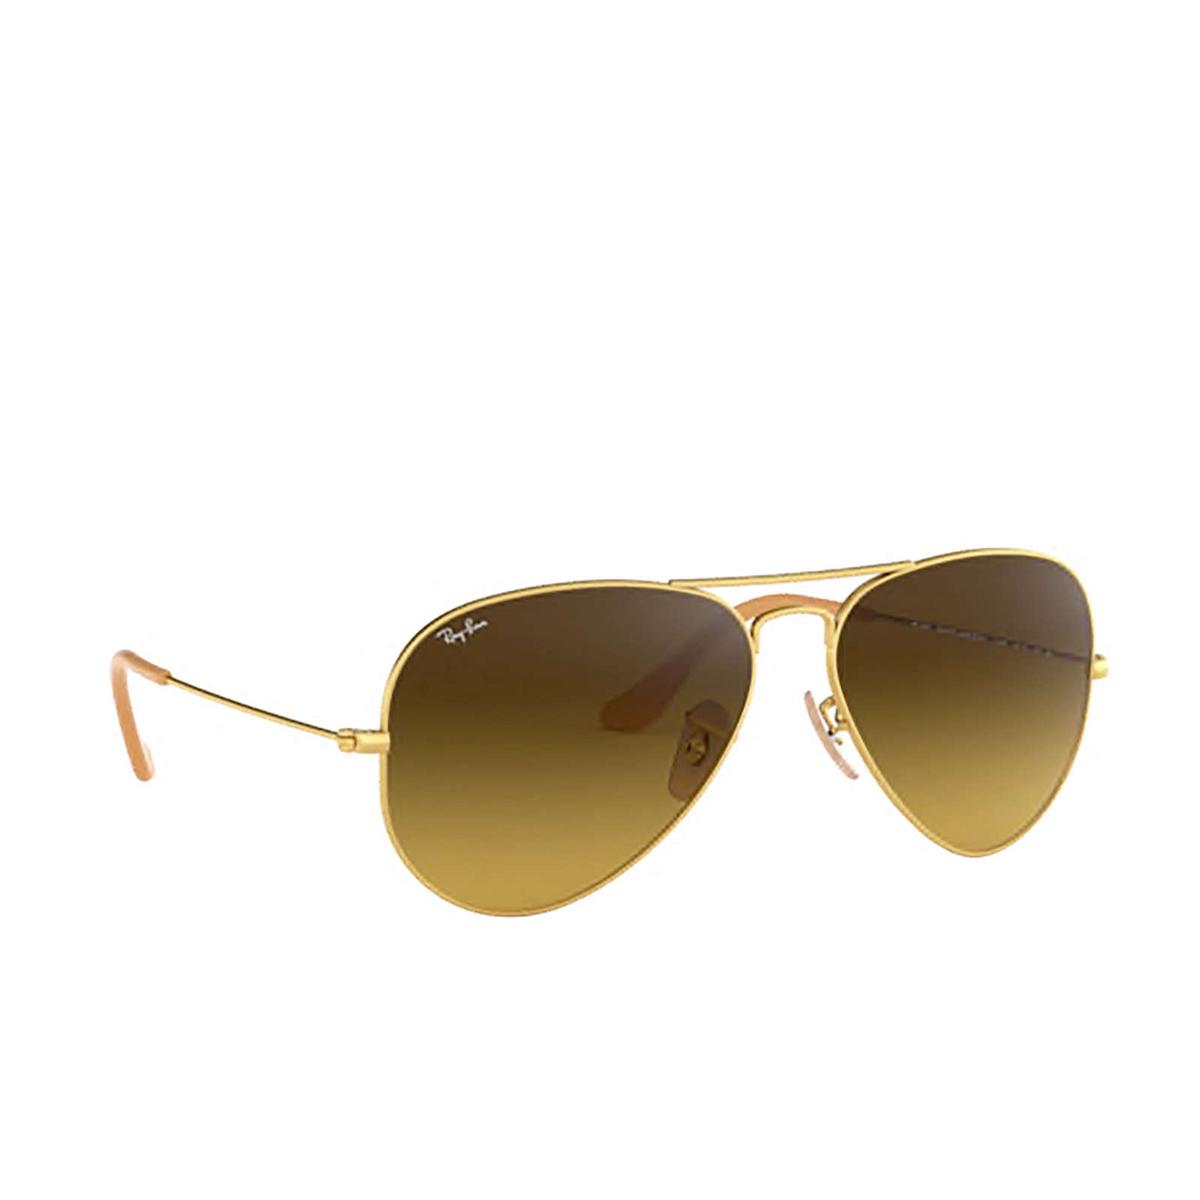 Ray-Ban® Aviator Sunglasses: Aviator Large Metal RB3025 color Matte Arista 112/85 - three-quarters view.